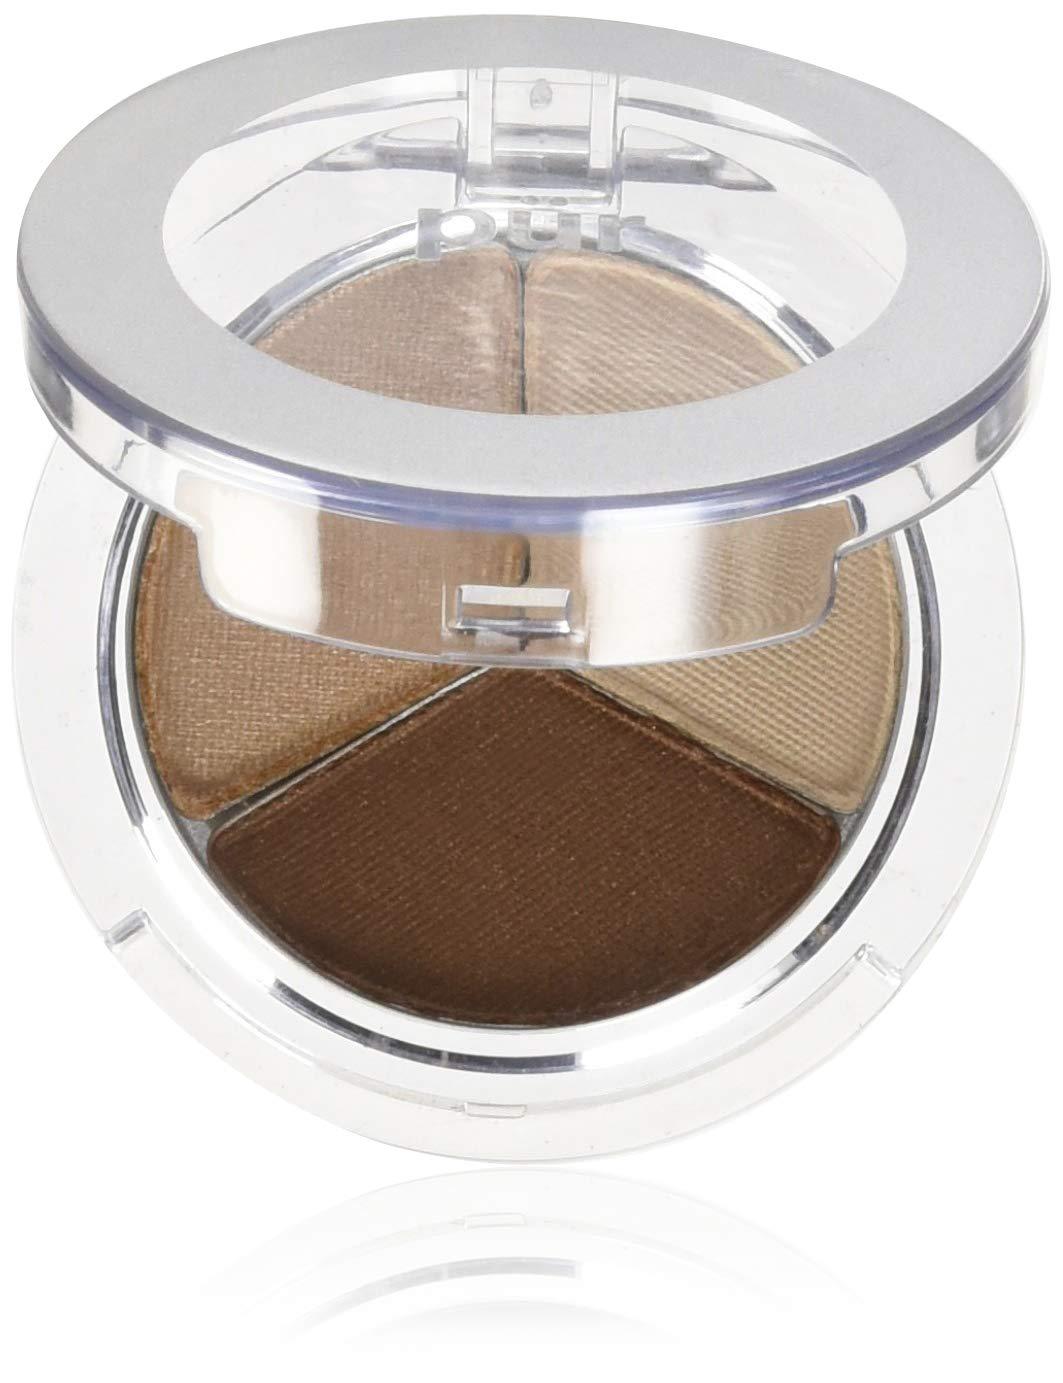 Amazon.com: PUR minerales Perfect Fit sombra de ojos Trio, 0 ...